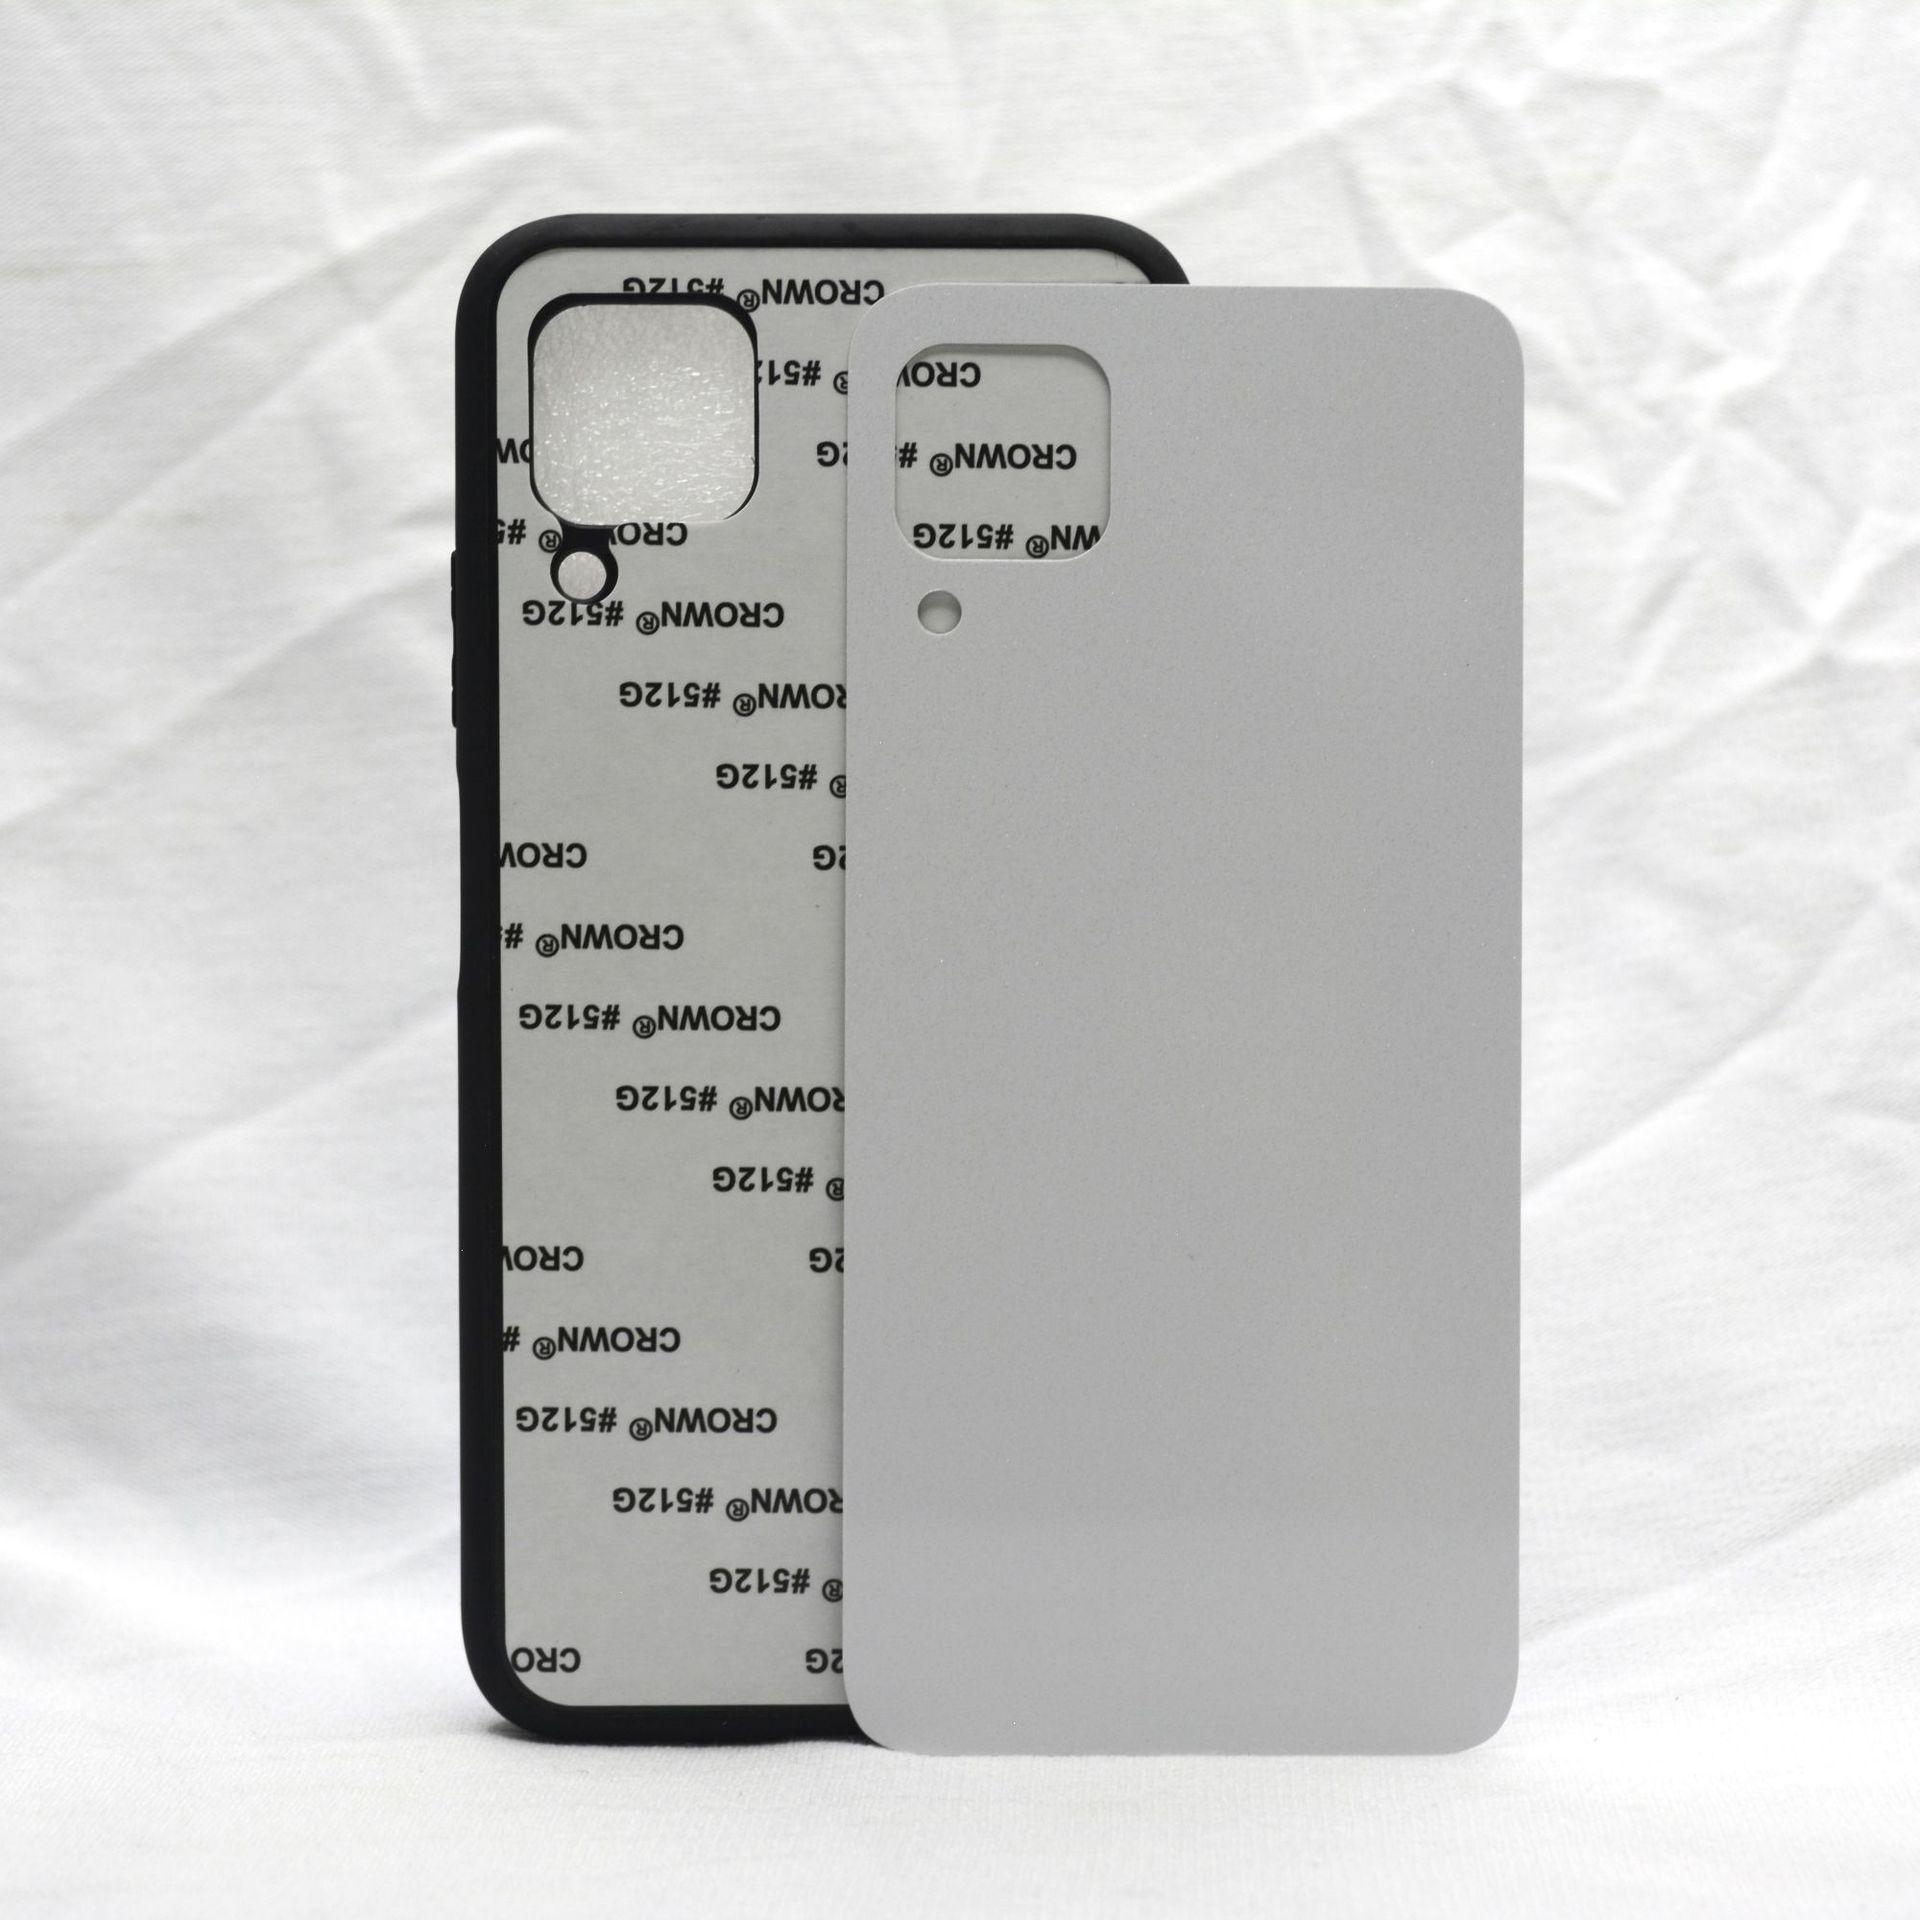 Boş 2D Süblimasyon Kılıf TPU + PC Isı Transferi Telefon Kılıfları Kapak iphone 12 Mini 11 Pro Max 7 8 artı x xs XR